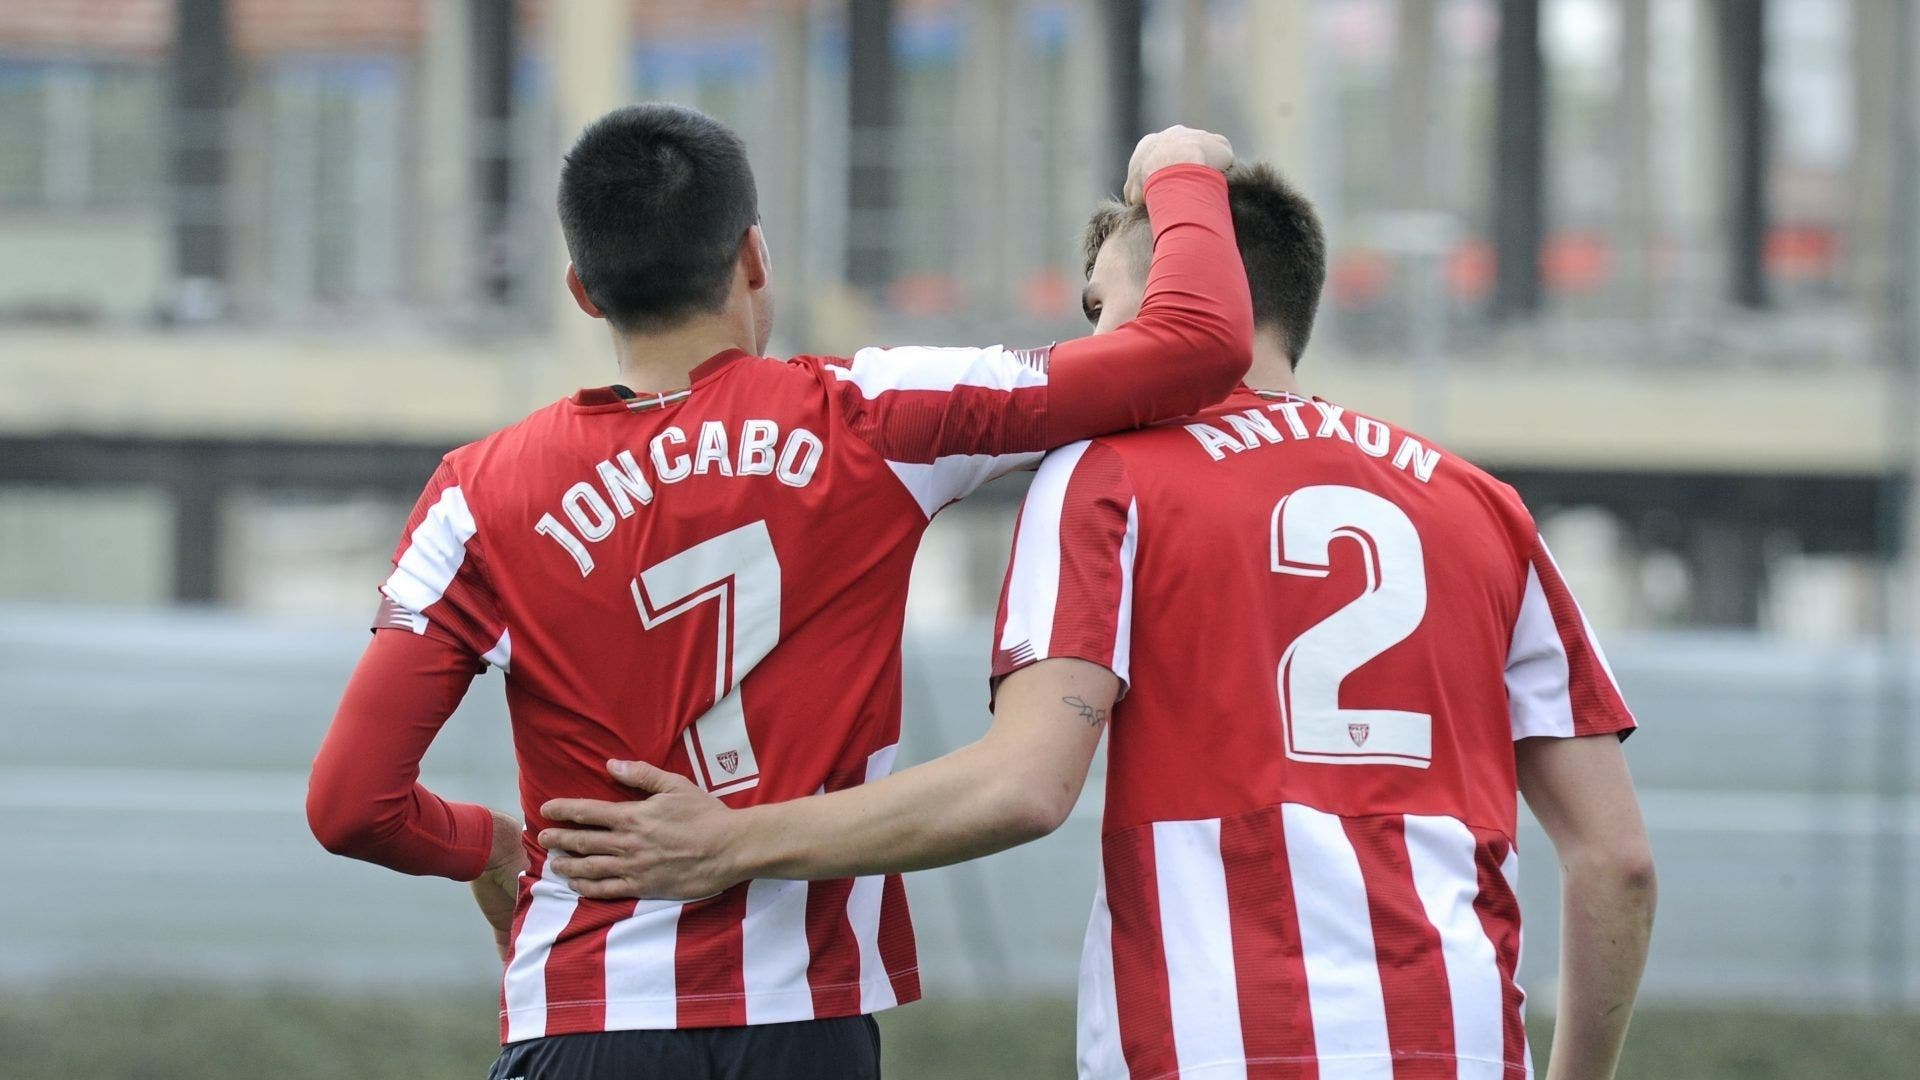 Bilbao Athletic